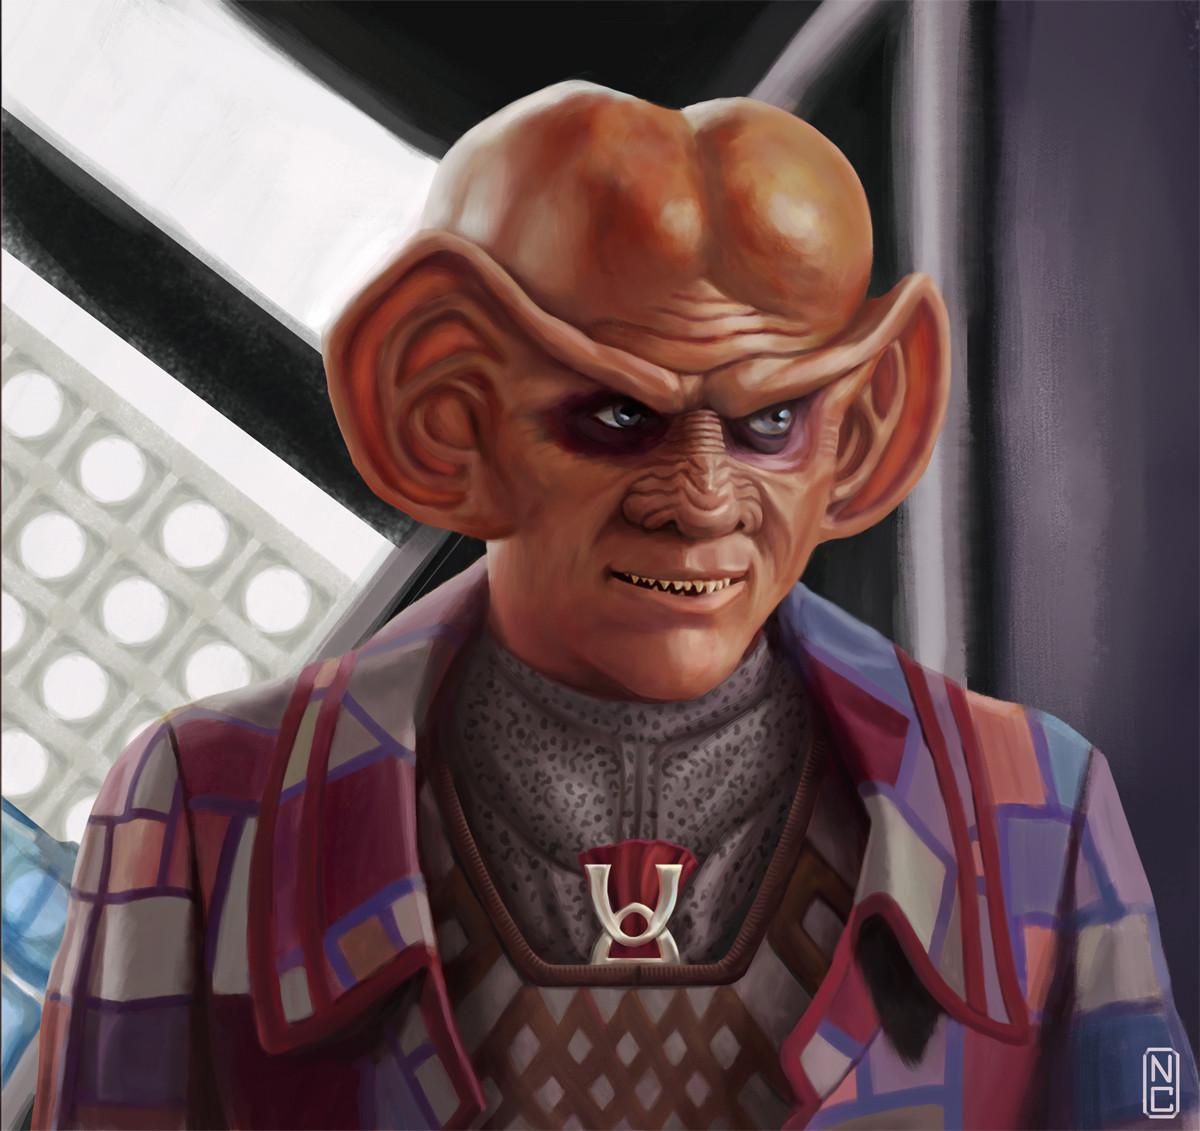 Nick chrissis quark 14